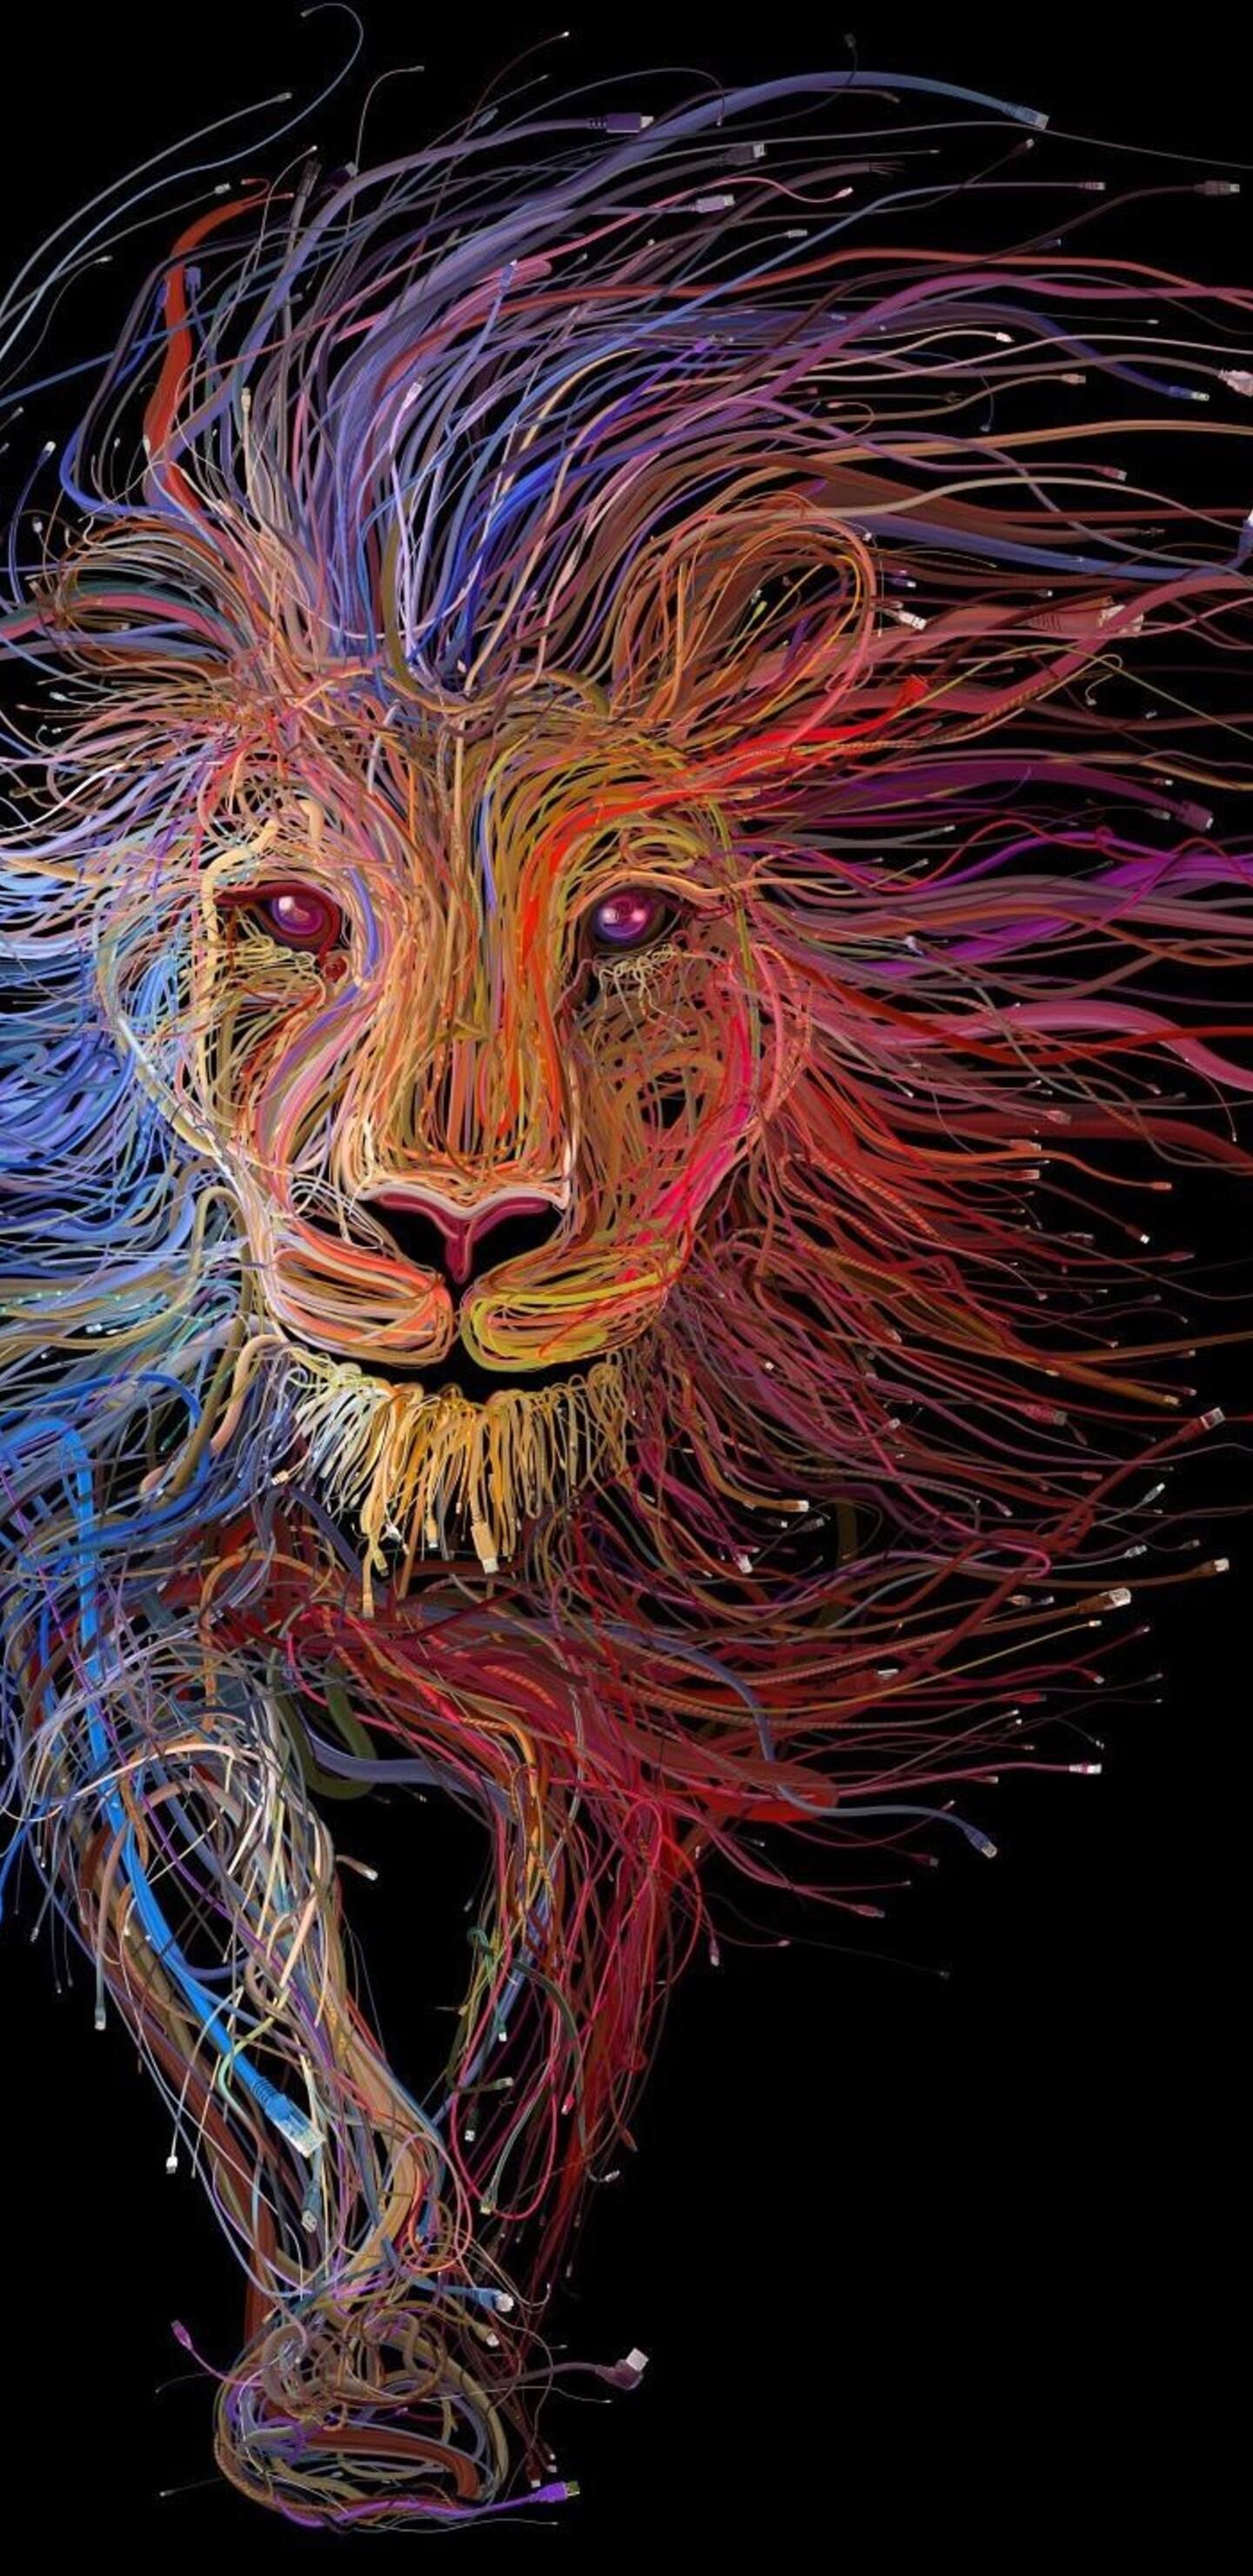 1440x2960 Lion Wires Art Samsung Galaxy Note 9 8 S9 S8 S8 Qhd Hd